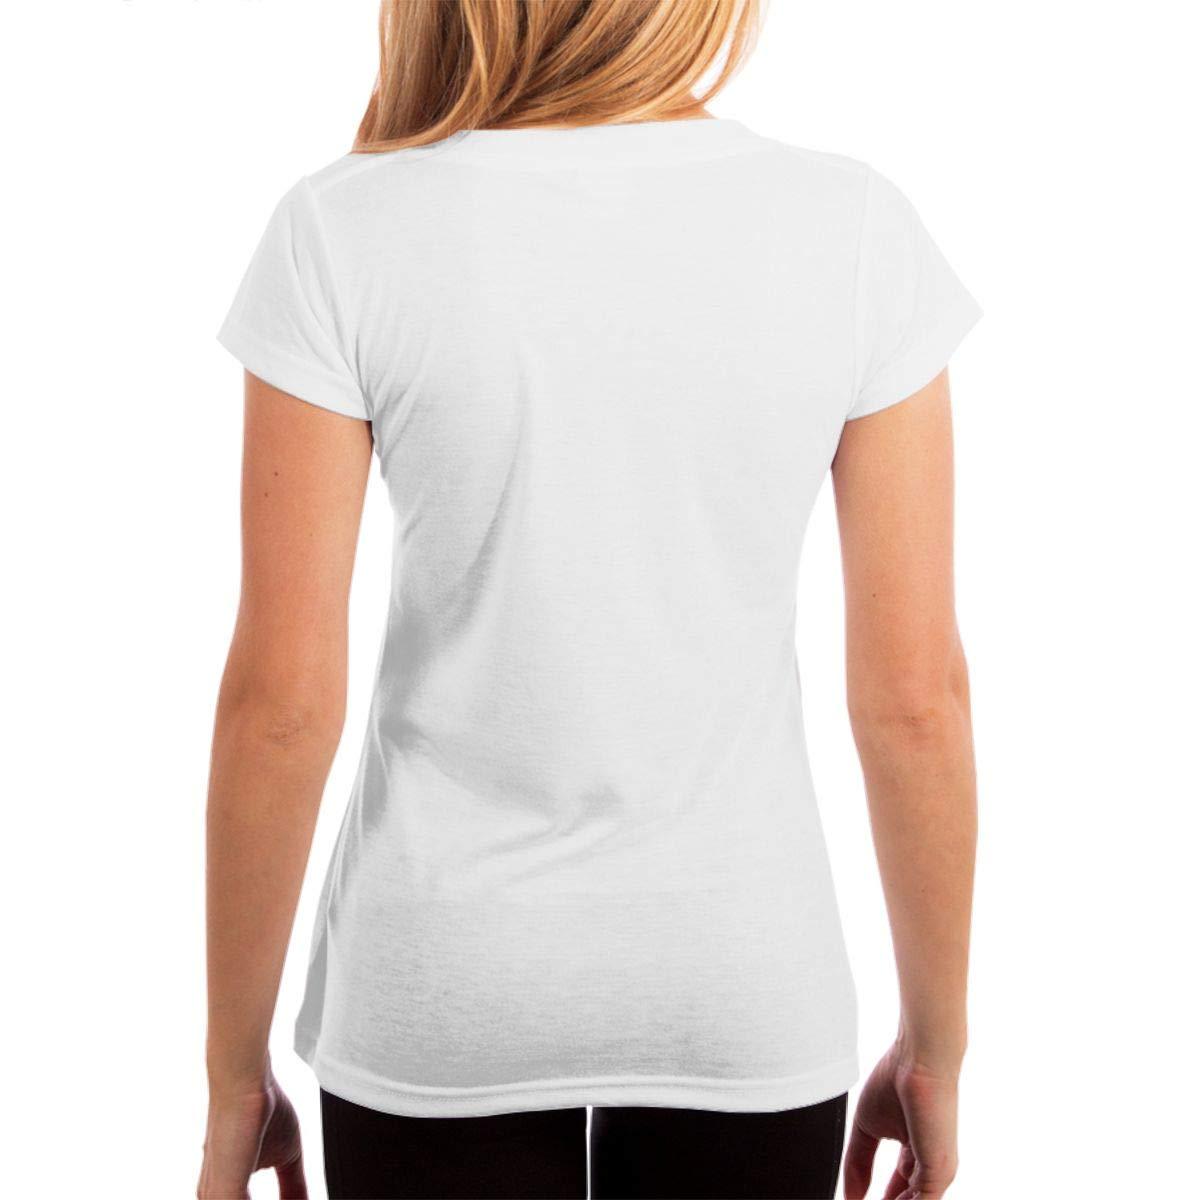 KshsDigu Mudhoney Womens V Neck Short Sleeve Tee Tops Cotton T-Shirts Black